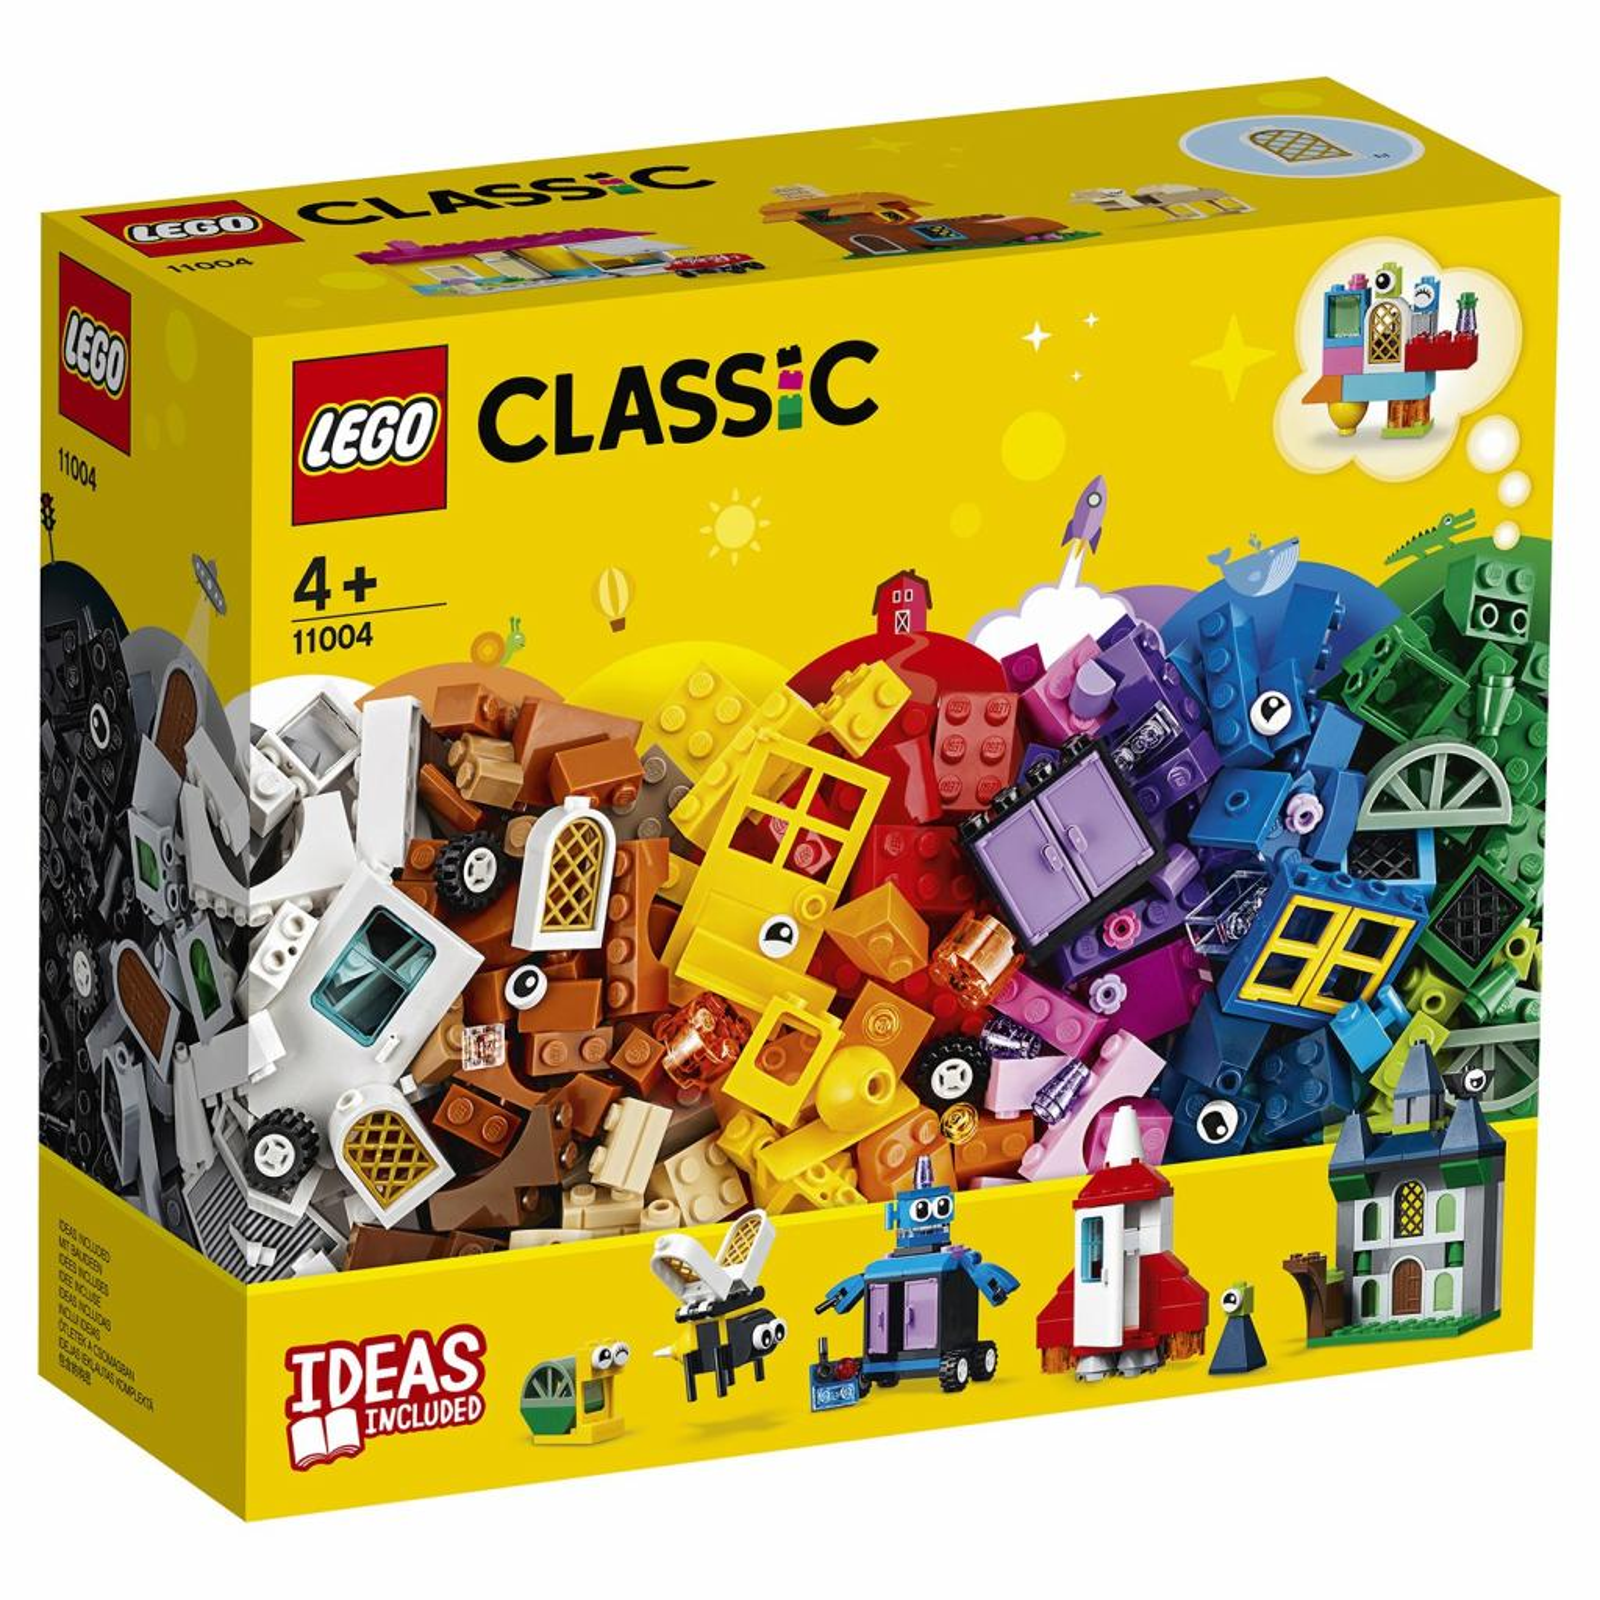 Конструктор LEGO Classic Набор для творчества с окнами 450 деталей (11004)